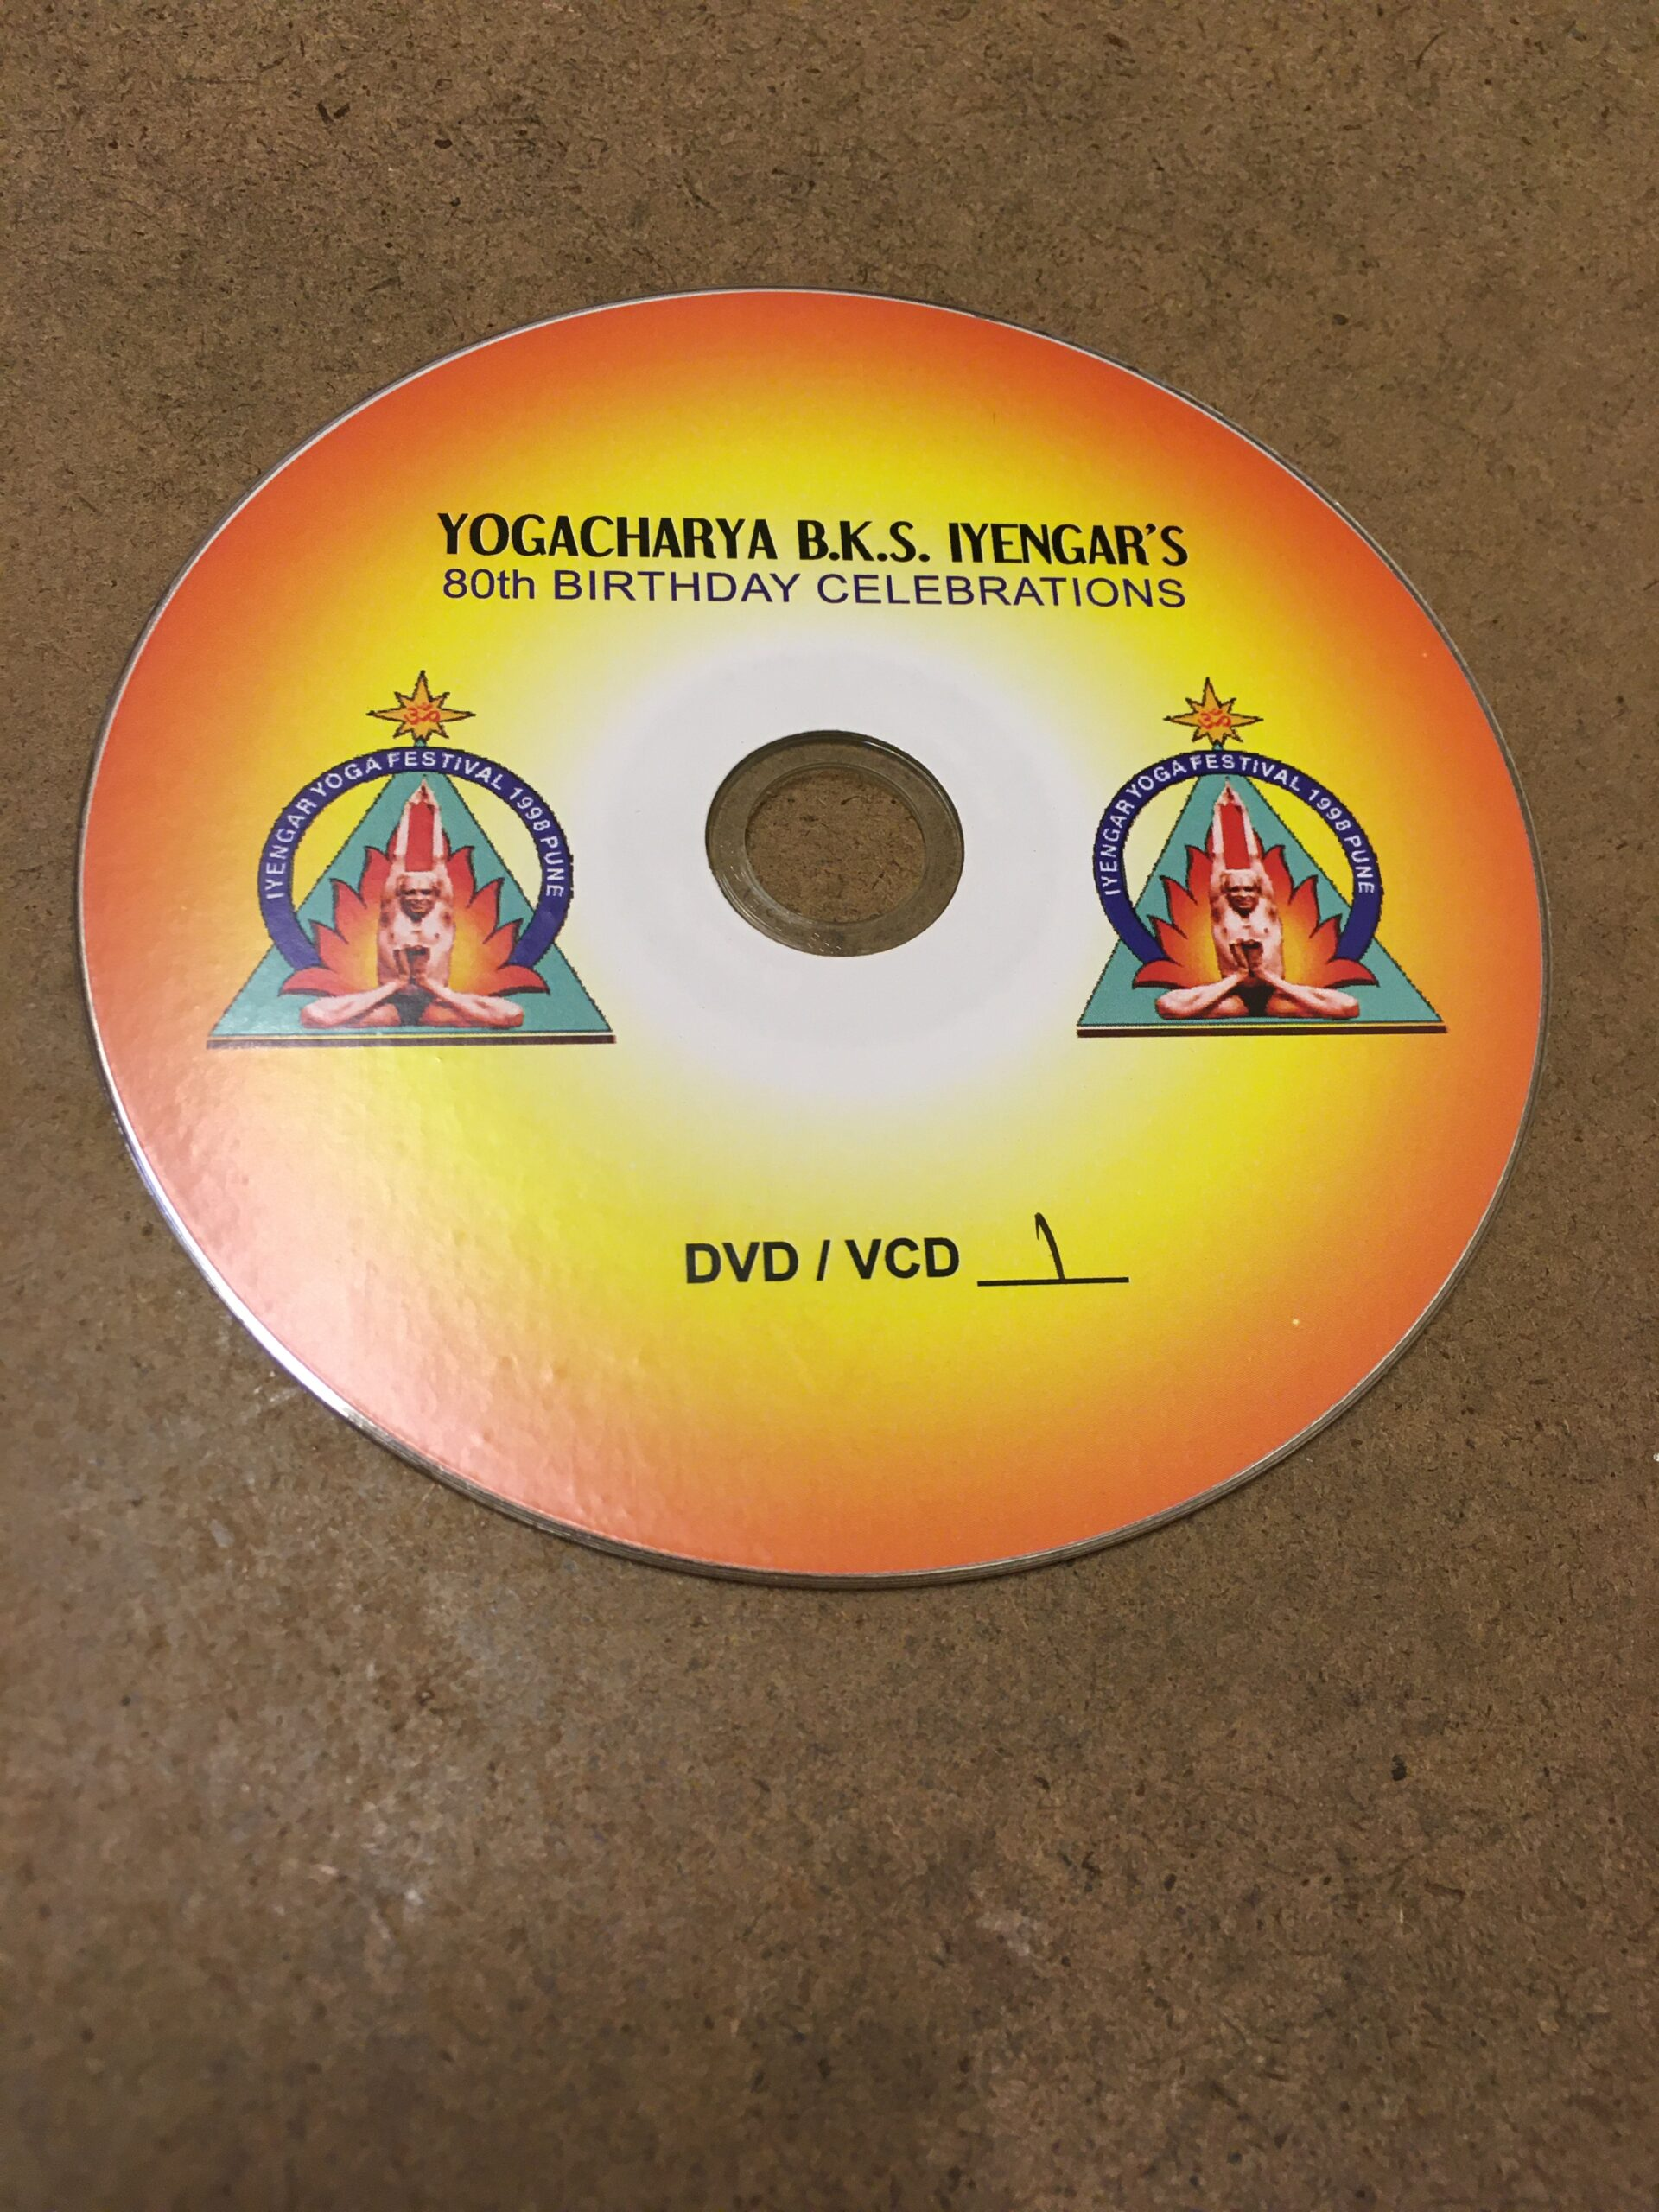 B.K.S. Iyengar's 80th Birthday Celebrations-VLC Format